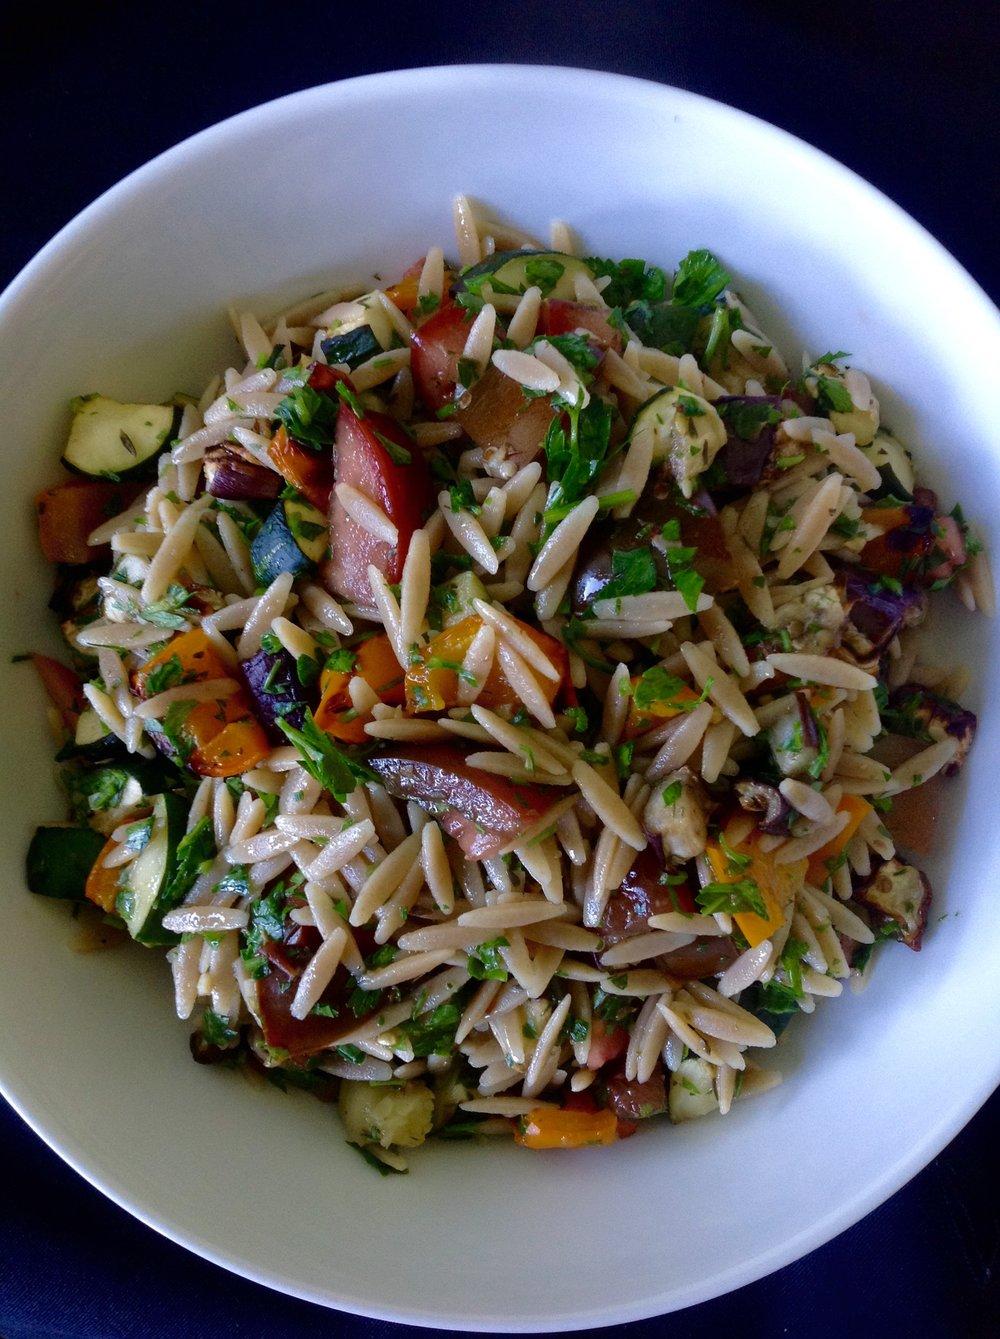 Whole Wheat Orzo Ratatouille - Healthy, Whole Grain, Pasta Salad, Oil-Free, Plant-Based, Vegan